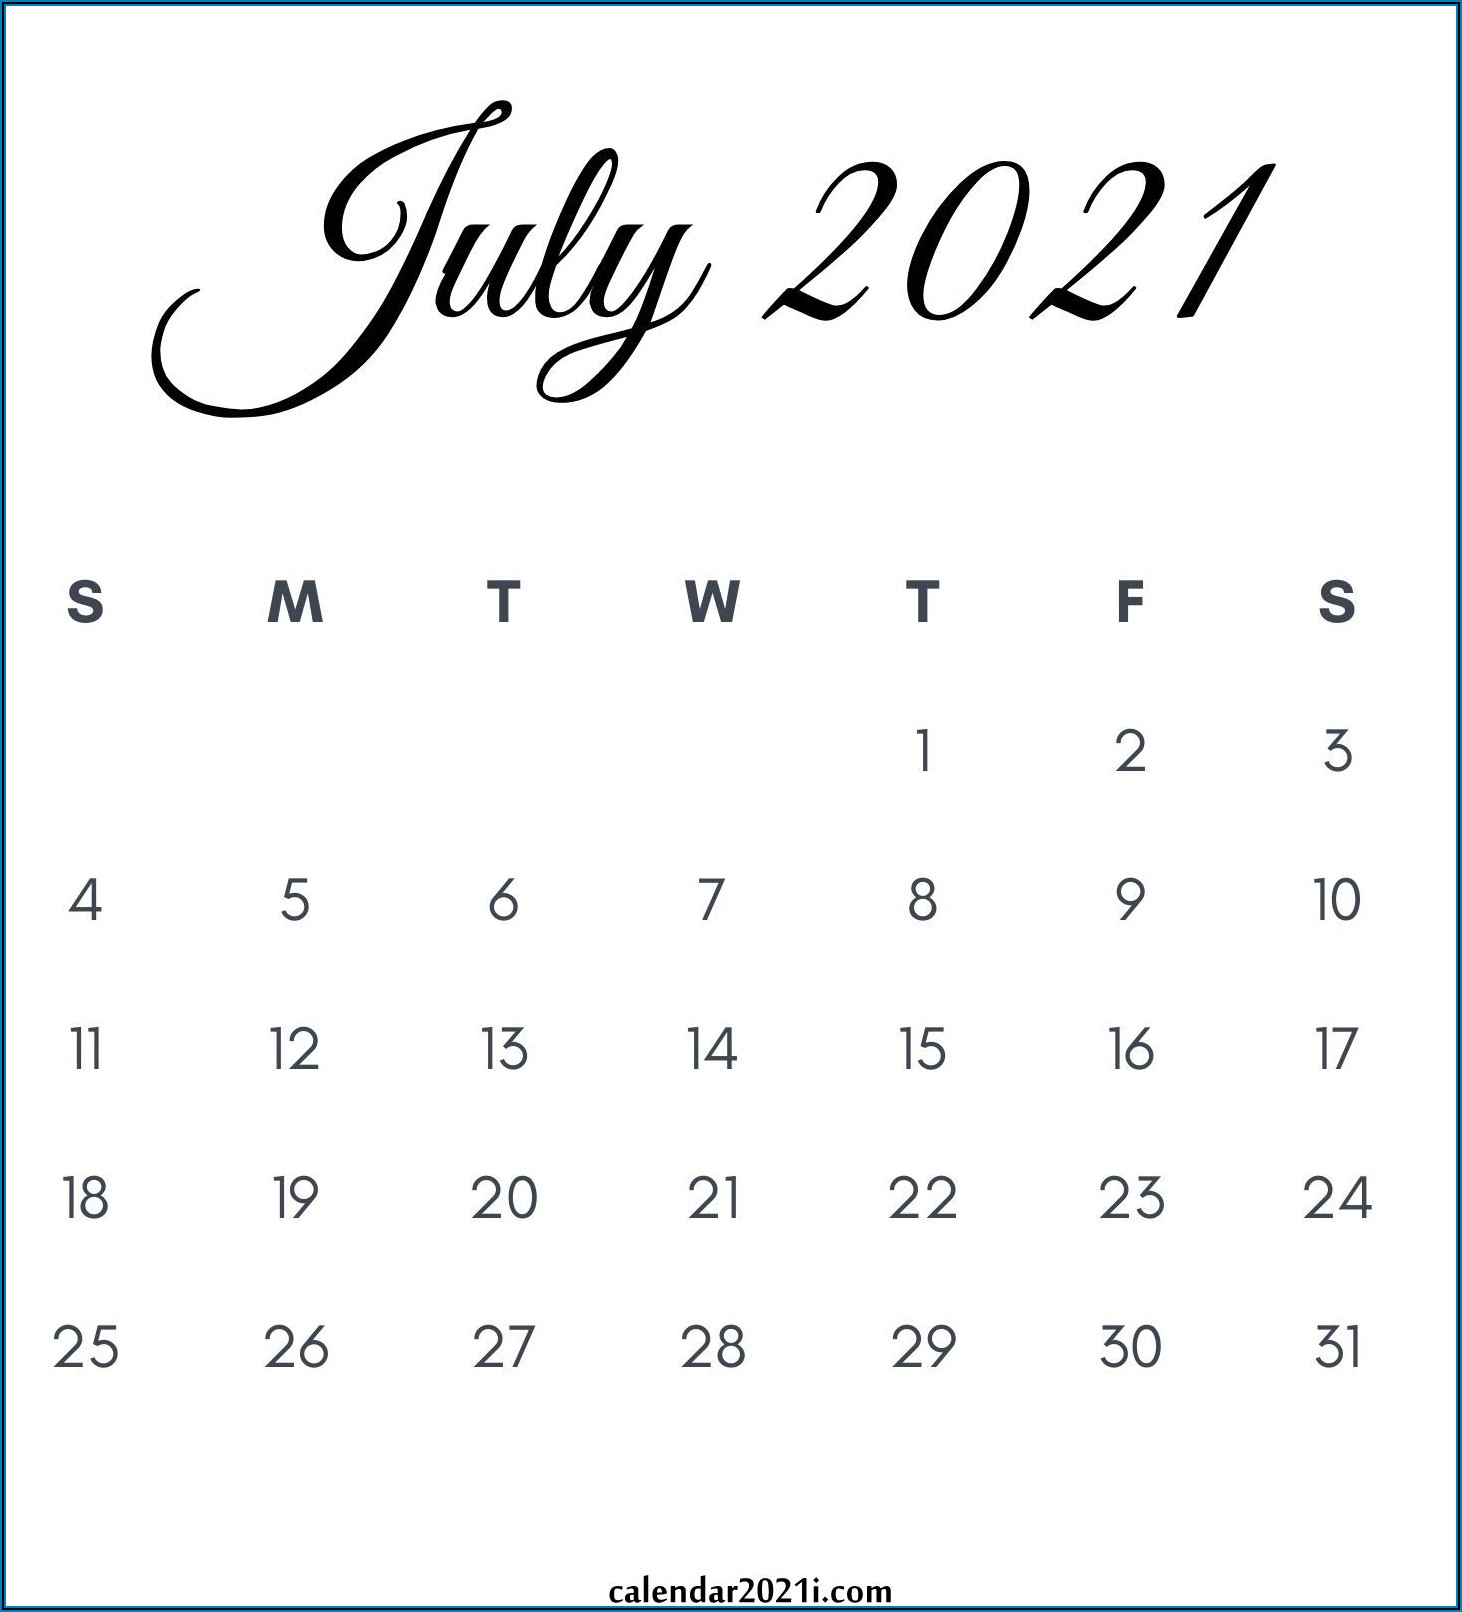 Free Printable Pregnancy Announcement Calendar August 2021